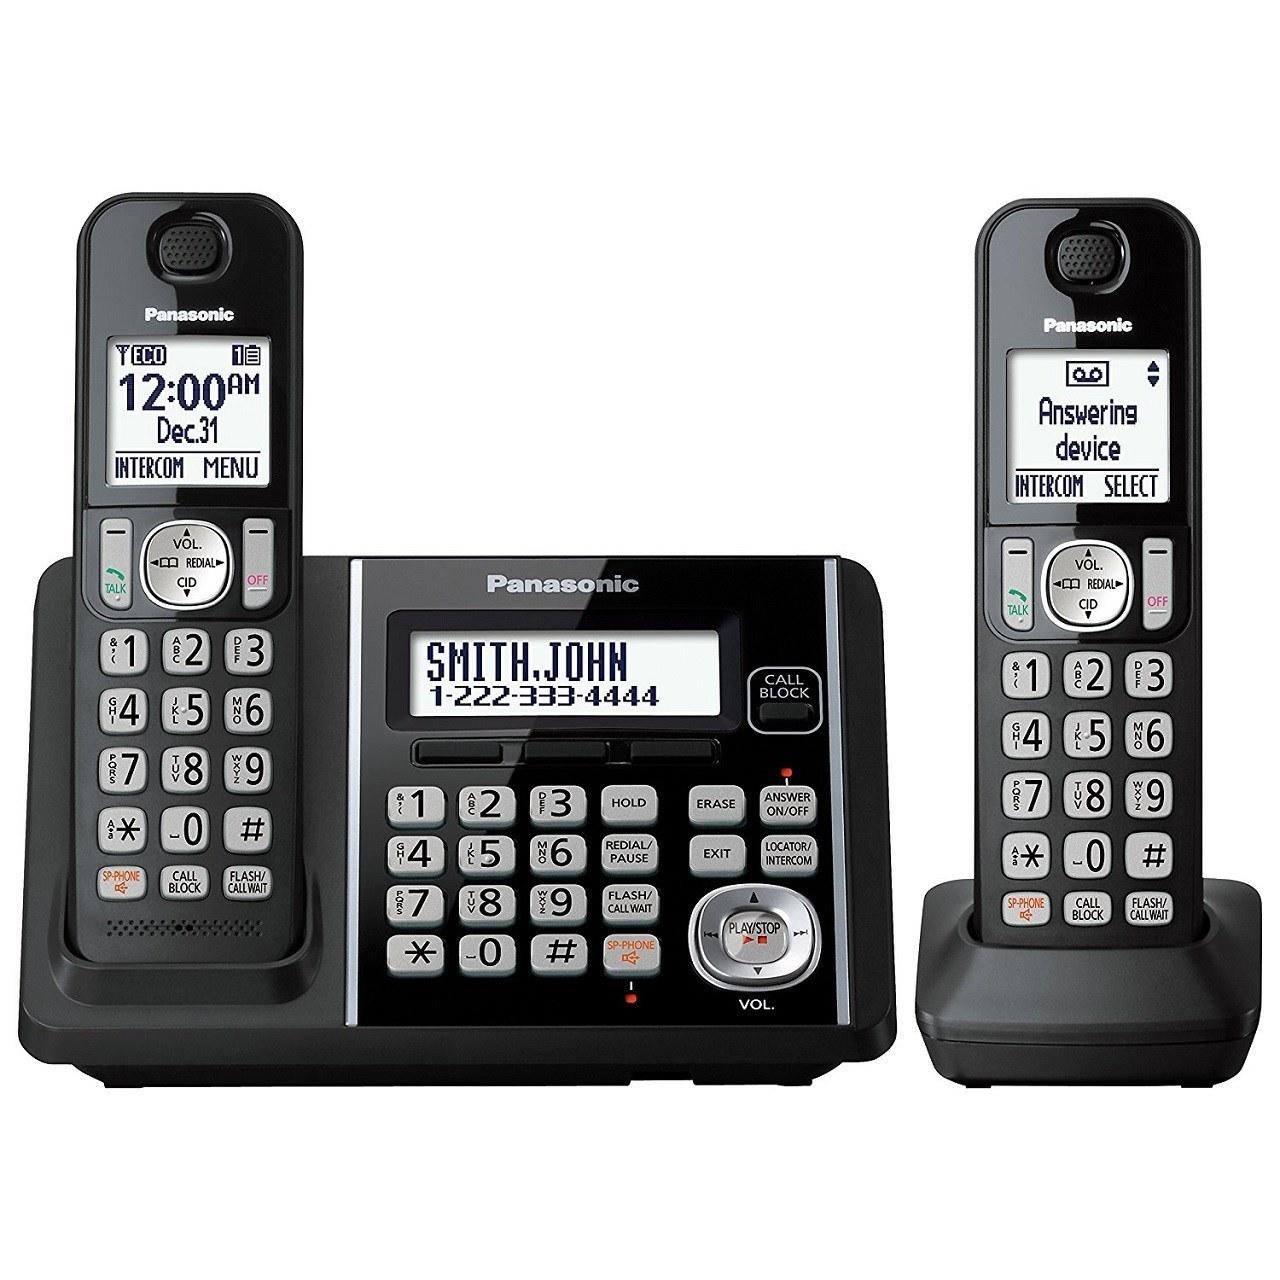 تصویر تلفن بی سیم دو گوشی پاناسونیک مدل KX-TG3752 Panasonic KX-TG3752 Wireless 2 Handsets Telephone